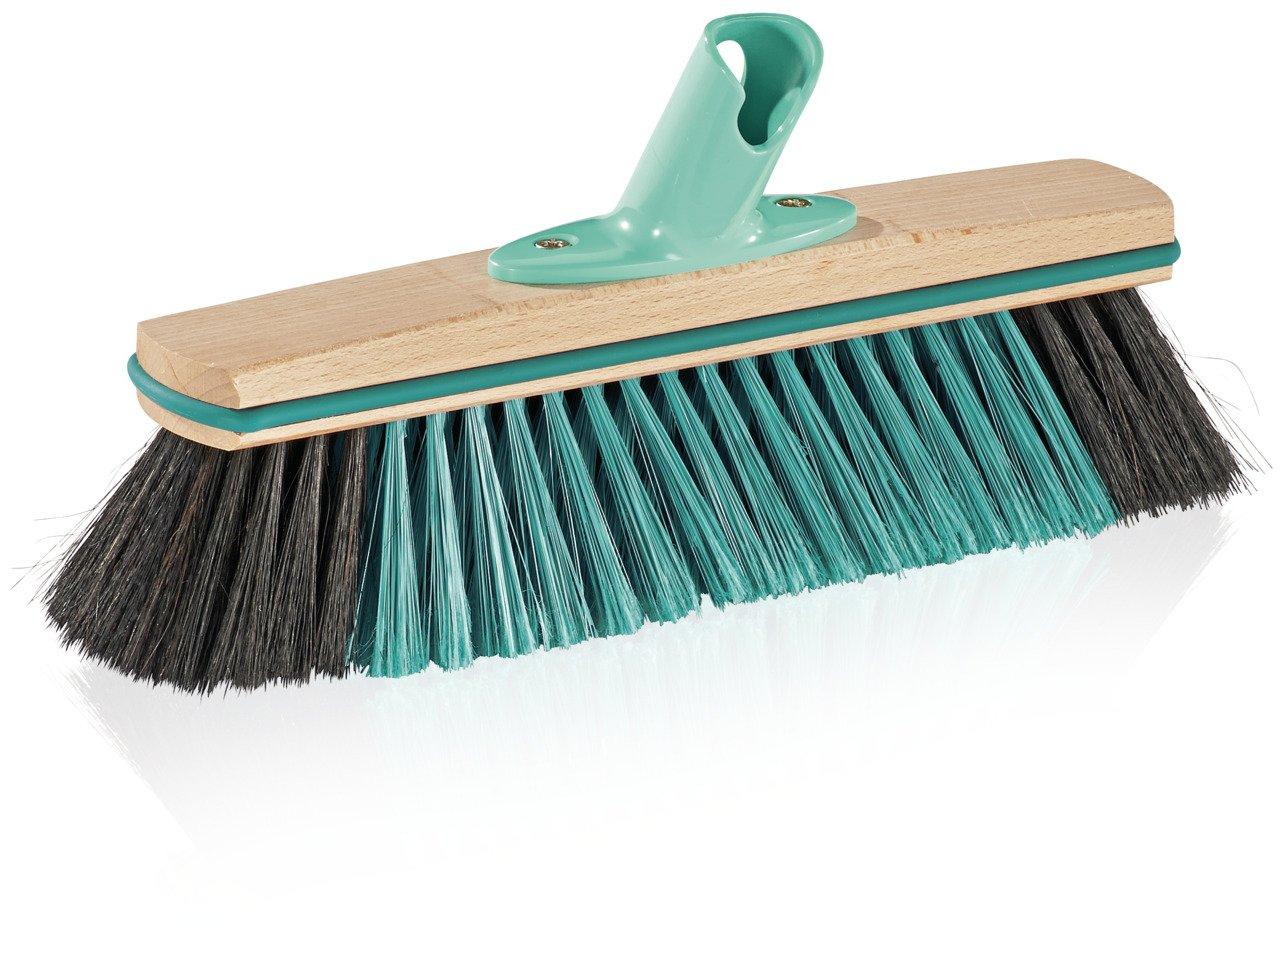 Leifheit Hard Floor Broom Xtra Clean Eco Plus 30 cm, Floor Broom, House Broom, Dustpan Brush, Wood / Mint Green, 45002 by Leifheit (Image #1)